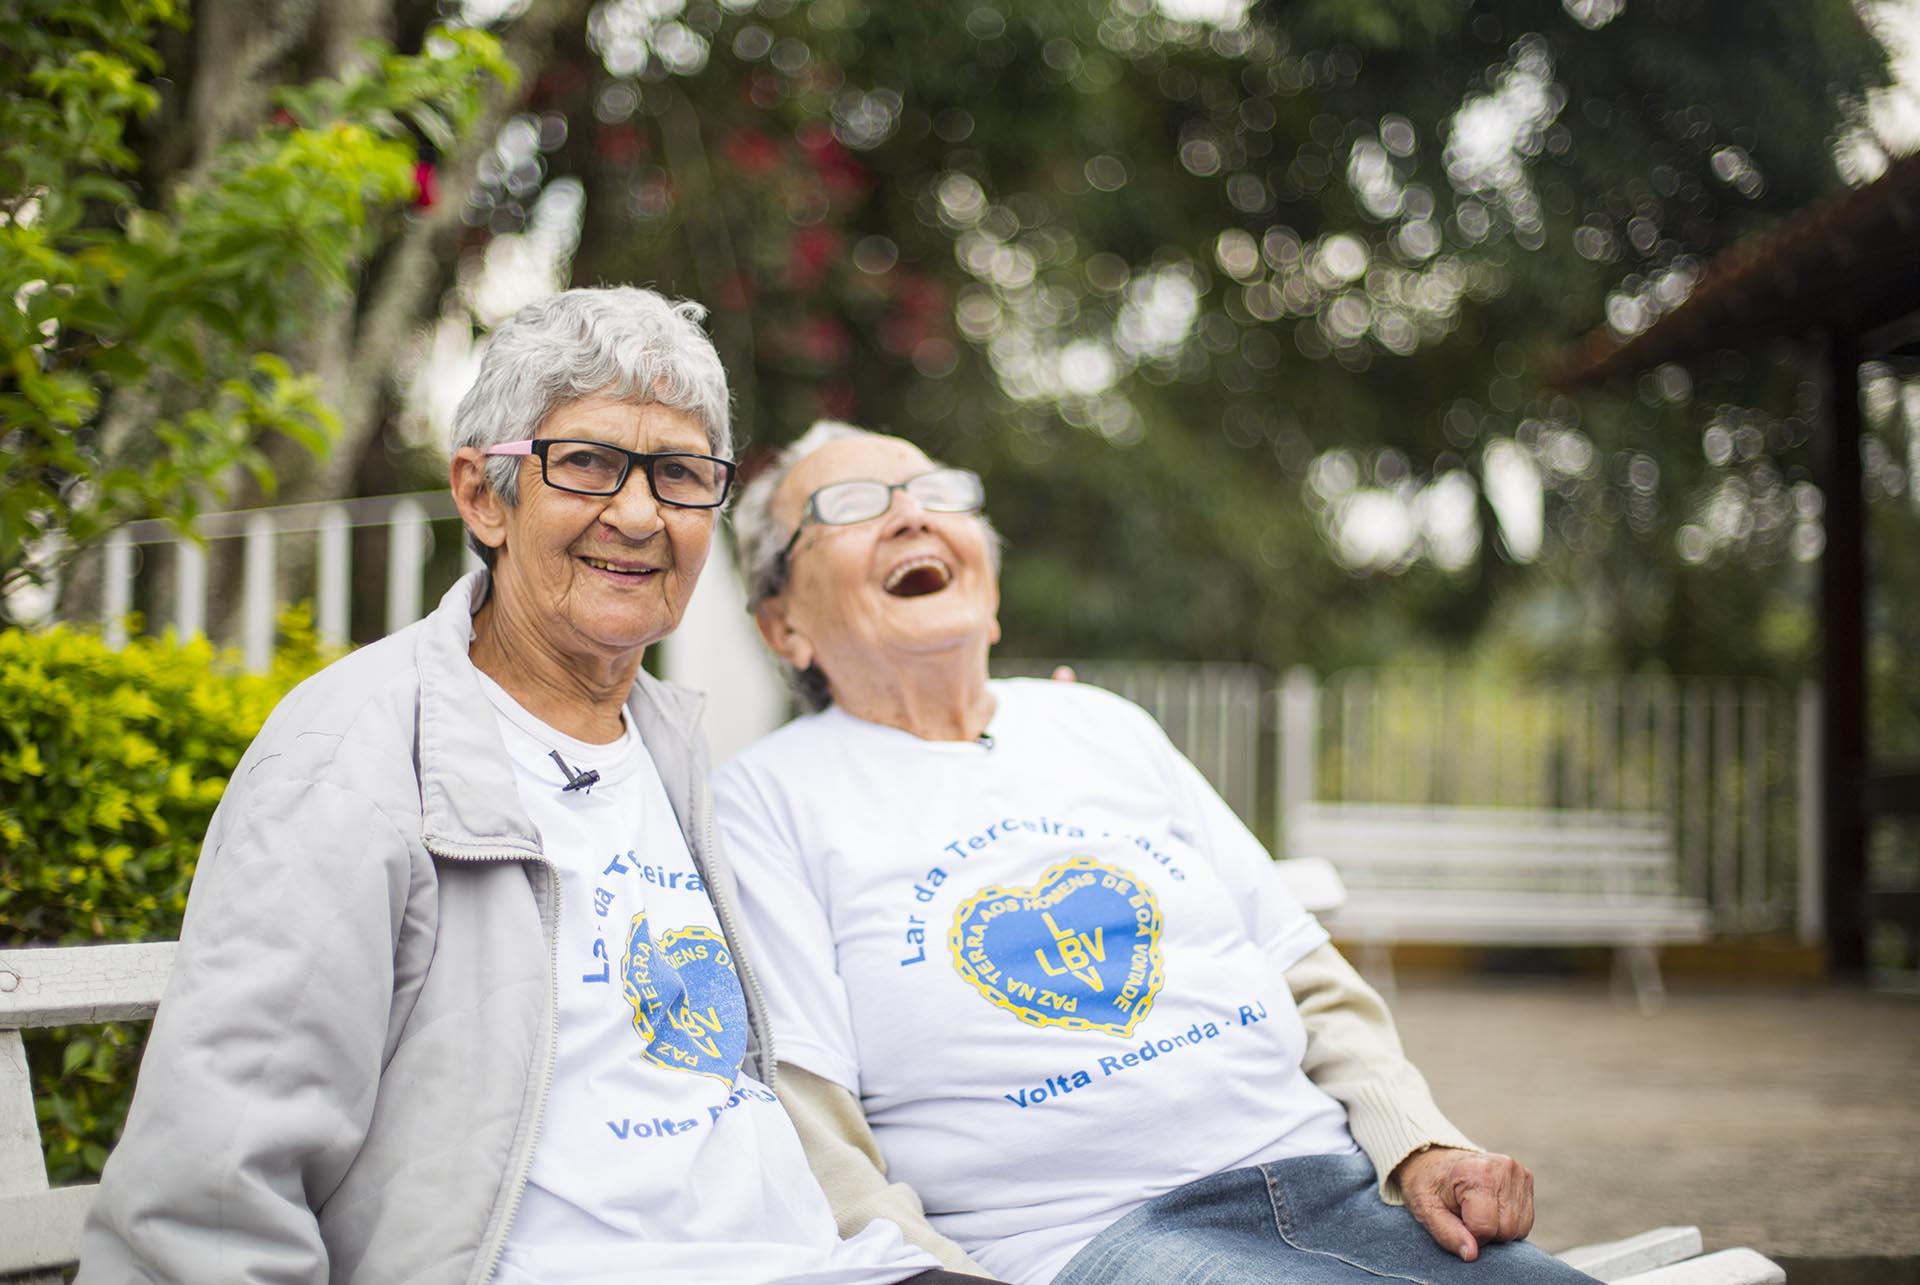 Volta Redonda/RJ — Amamos essa amizade verdadeira entre a dona Vera e a dona Matilde \o/